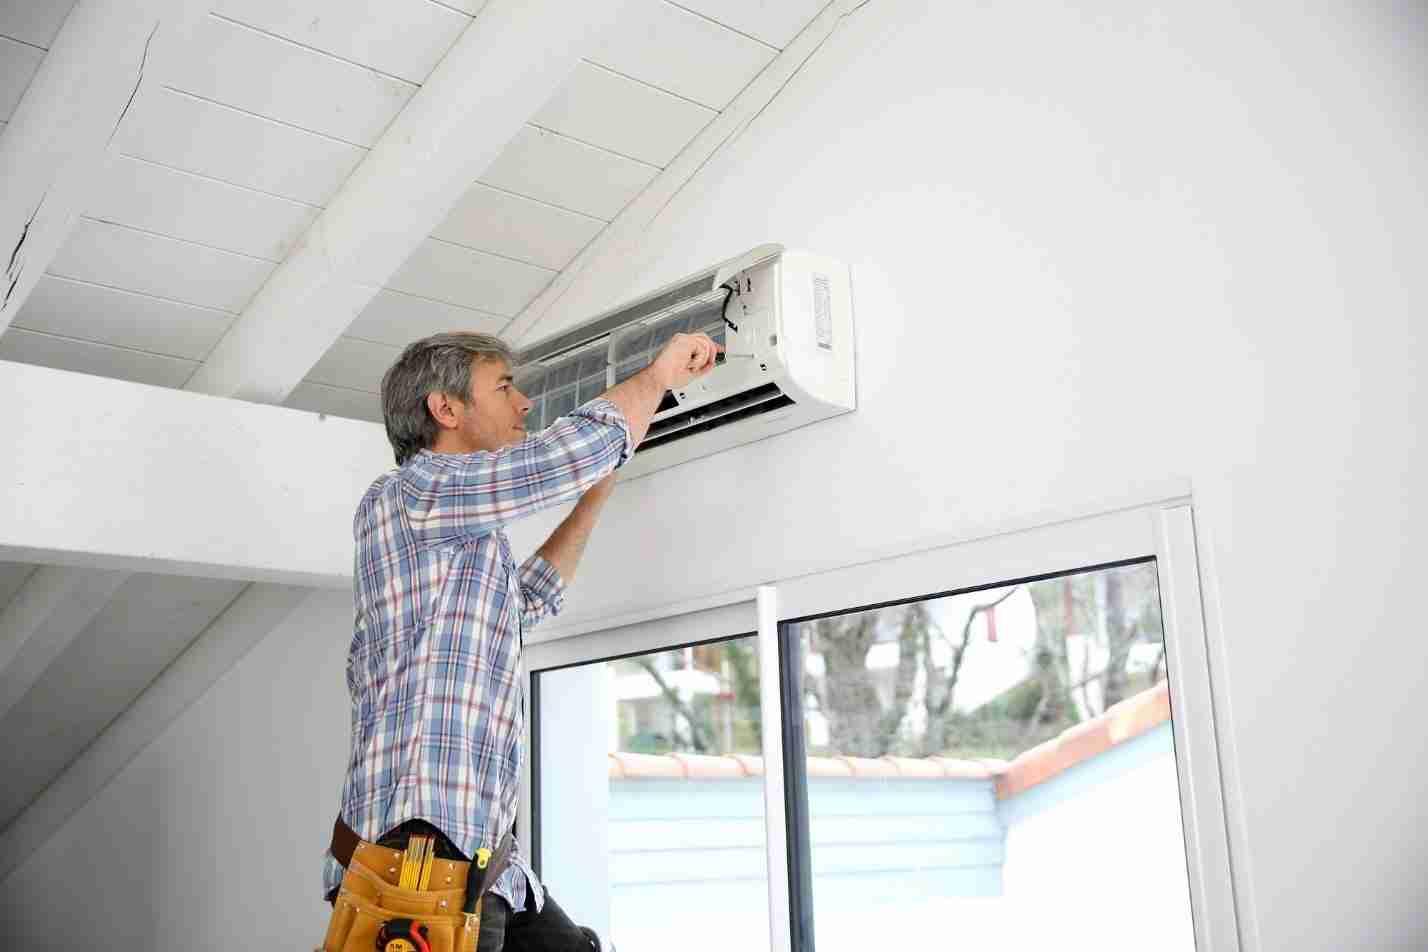 experts in air conditioning: man repairing AC unit.